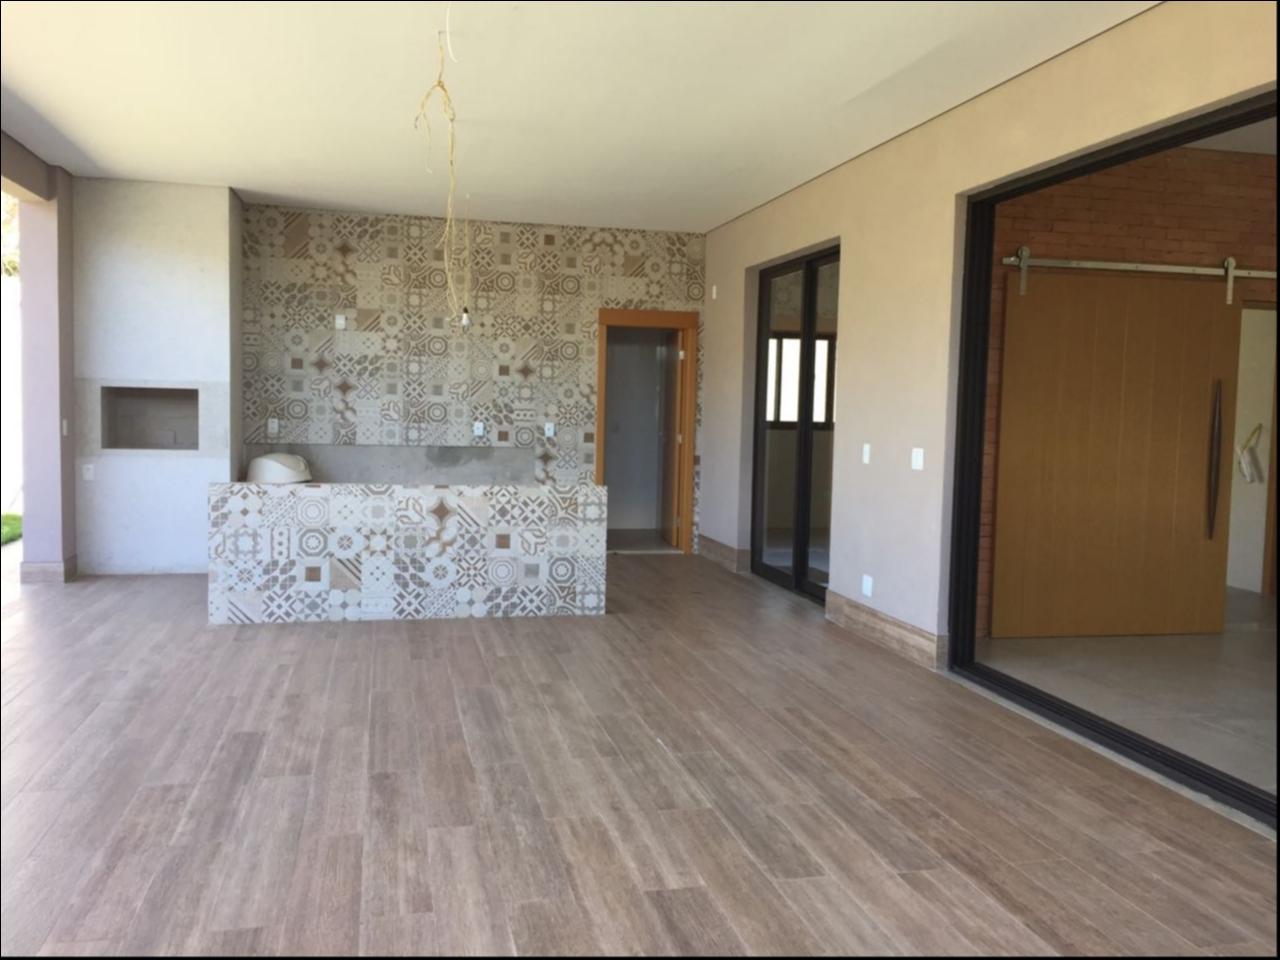 Casa Cond. Fechado  com 3 quartos sendo 3 Suítes no FLORAIS CUIABA, Cuiabá  - MT